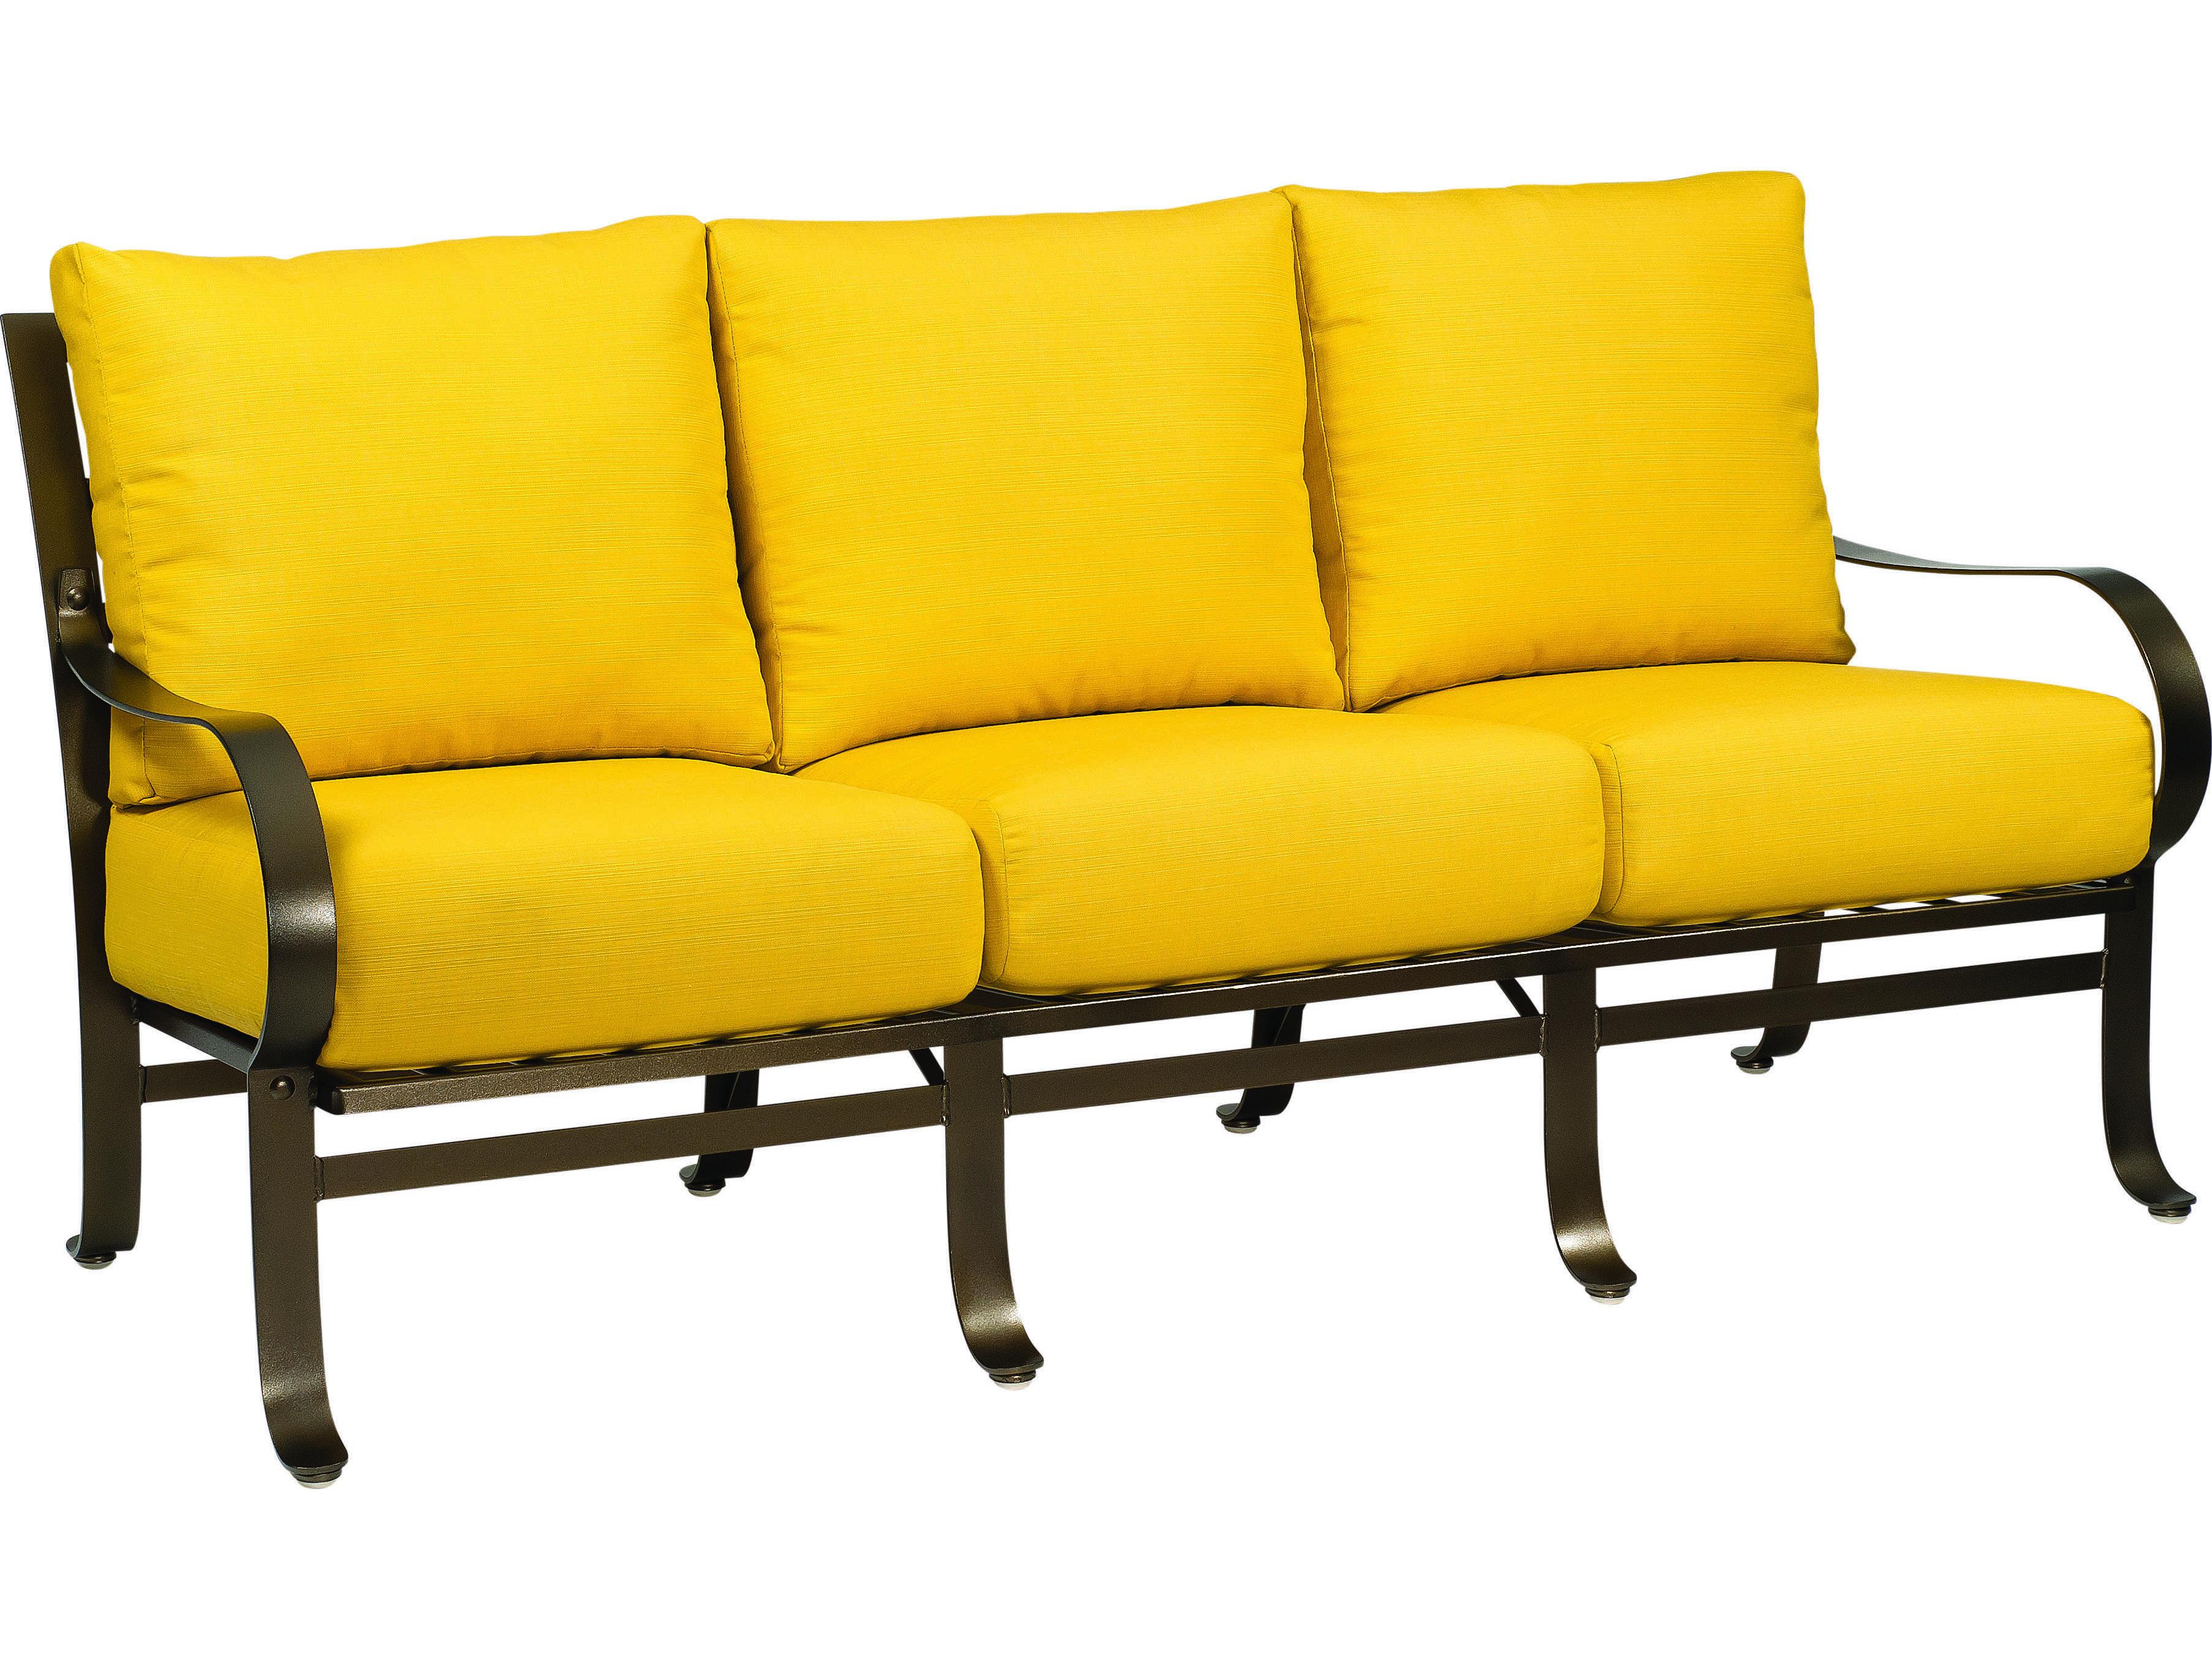 wrought iron sofa set online muji mold urethane review woodard cascade 2w0020